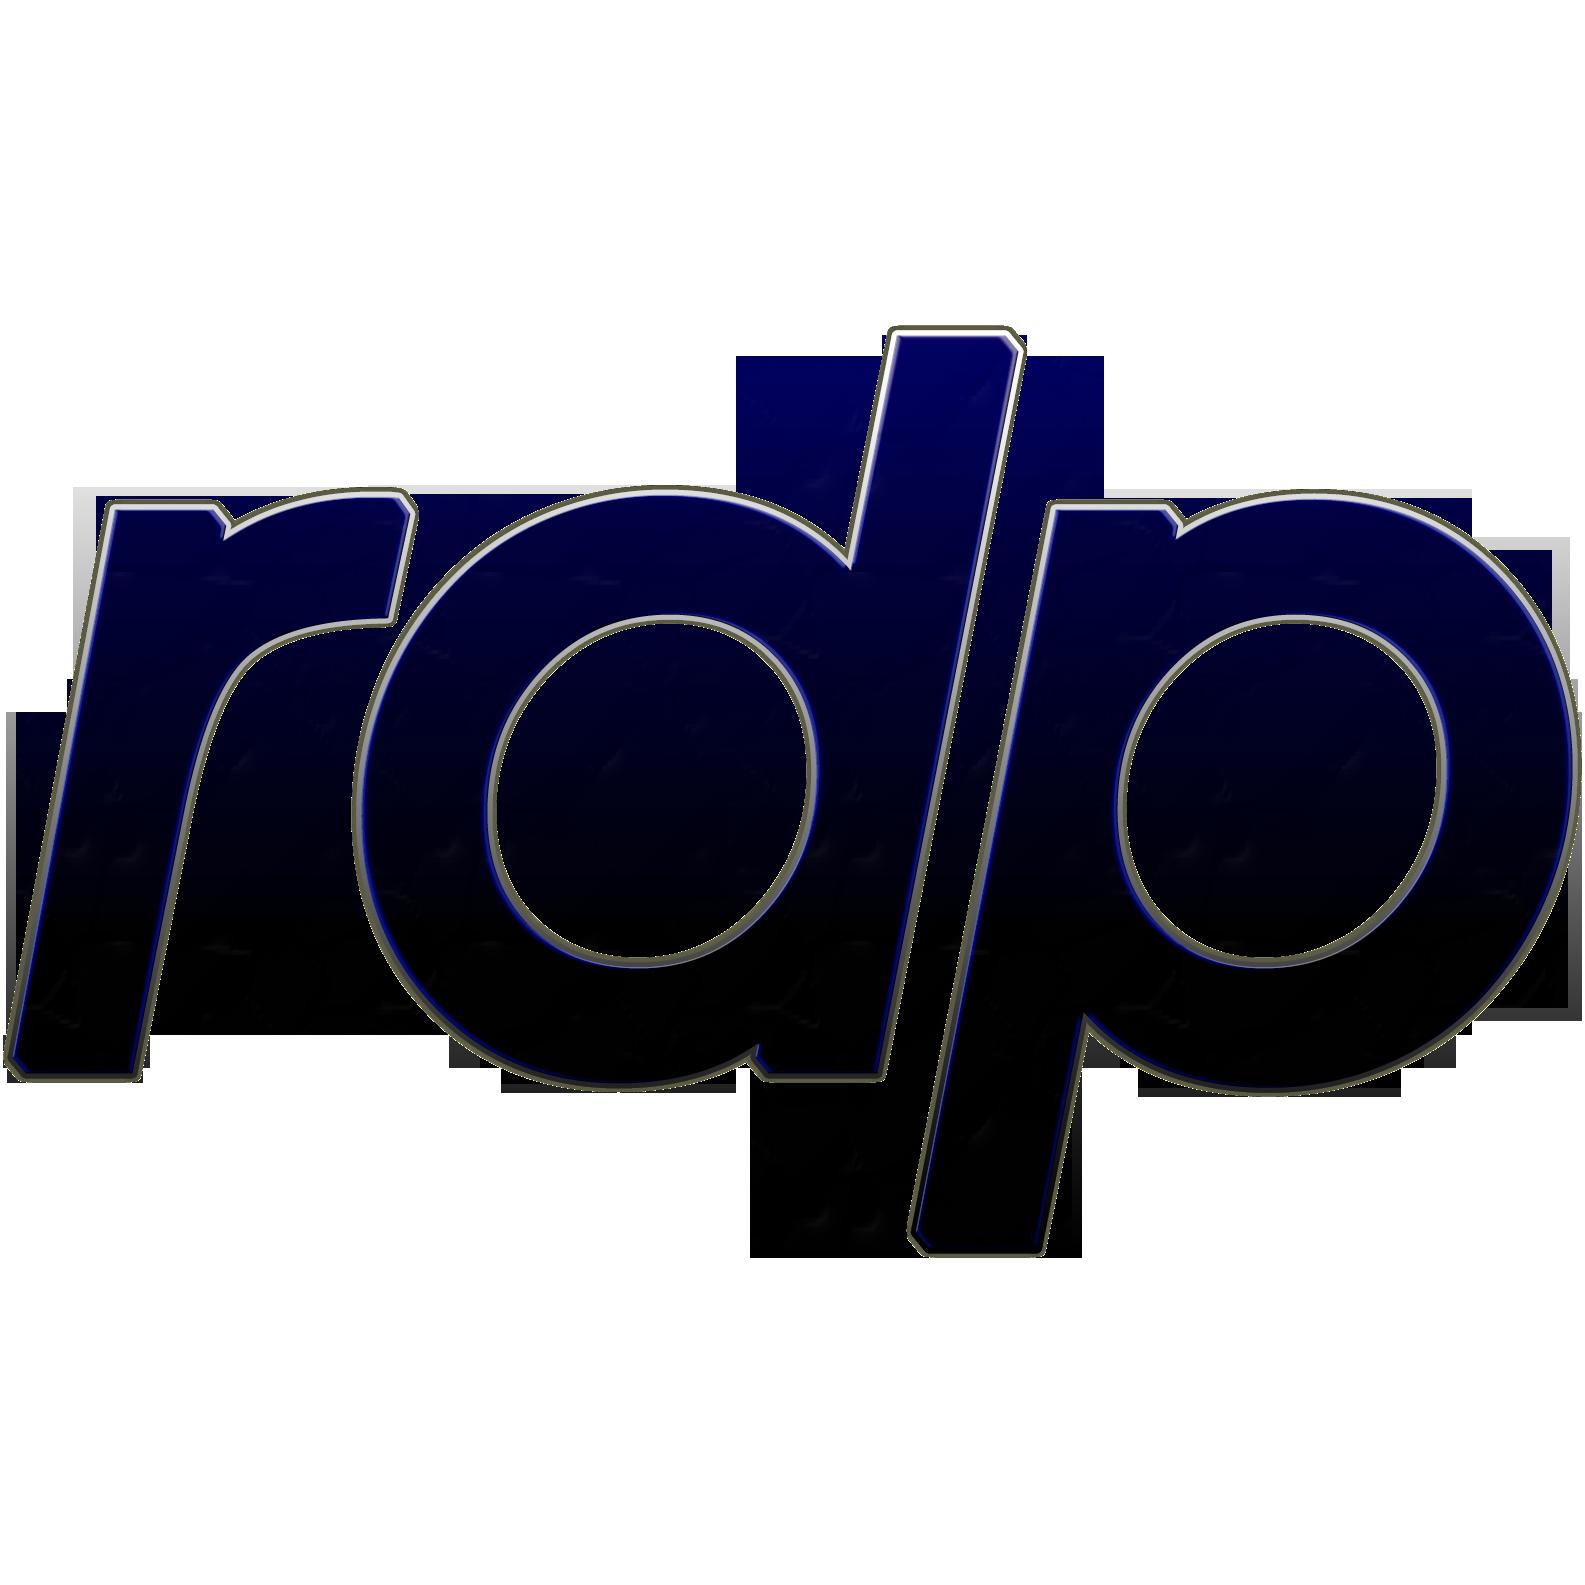 radiodifusiondelprincipado